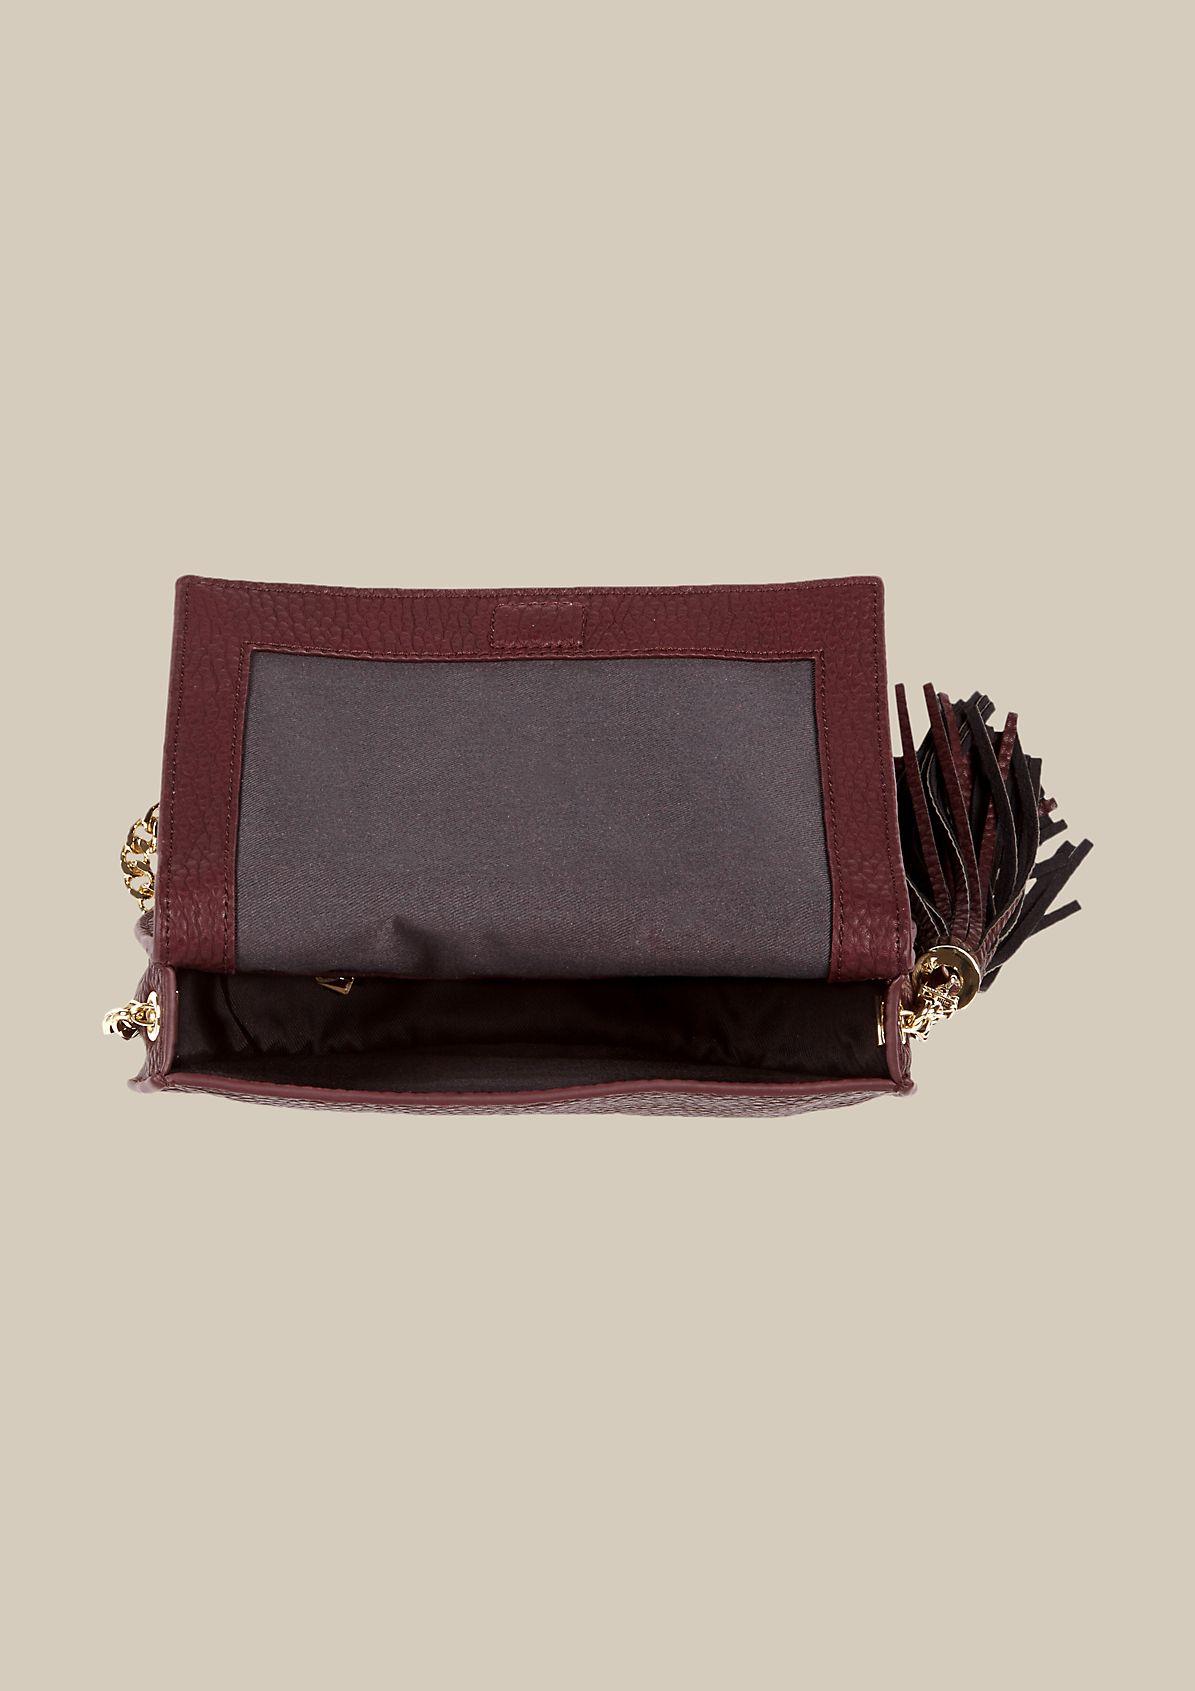 Elegant evening bag in imitation leather from s.Oliver